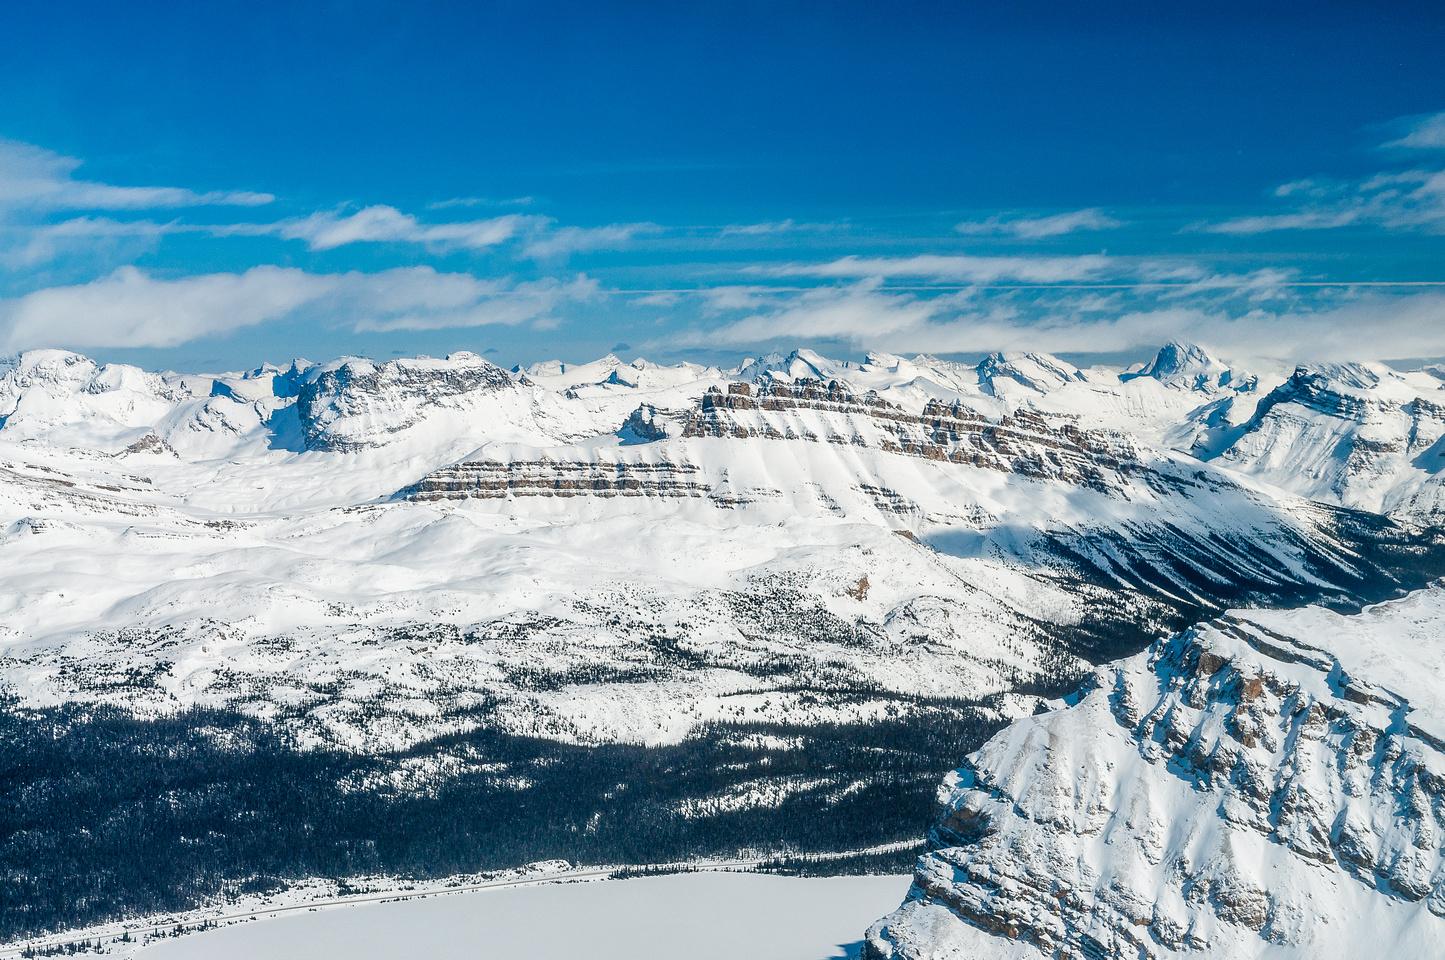 Looking over Dolomite Peak towards Cataract Peak (R) and Puzzle (L).